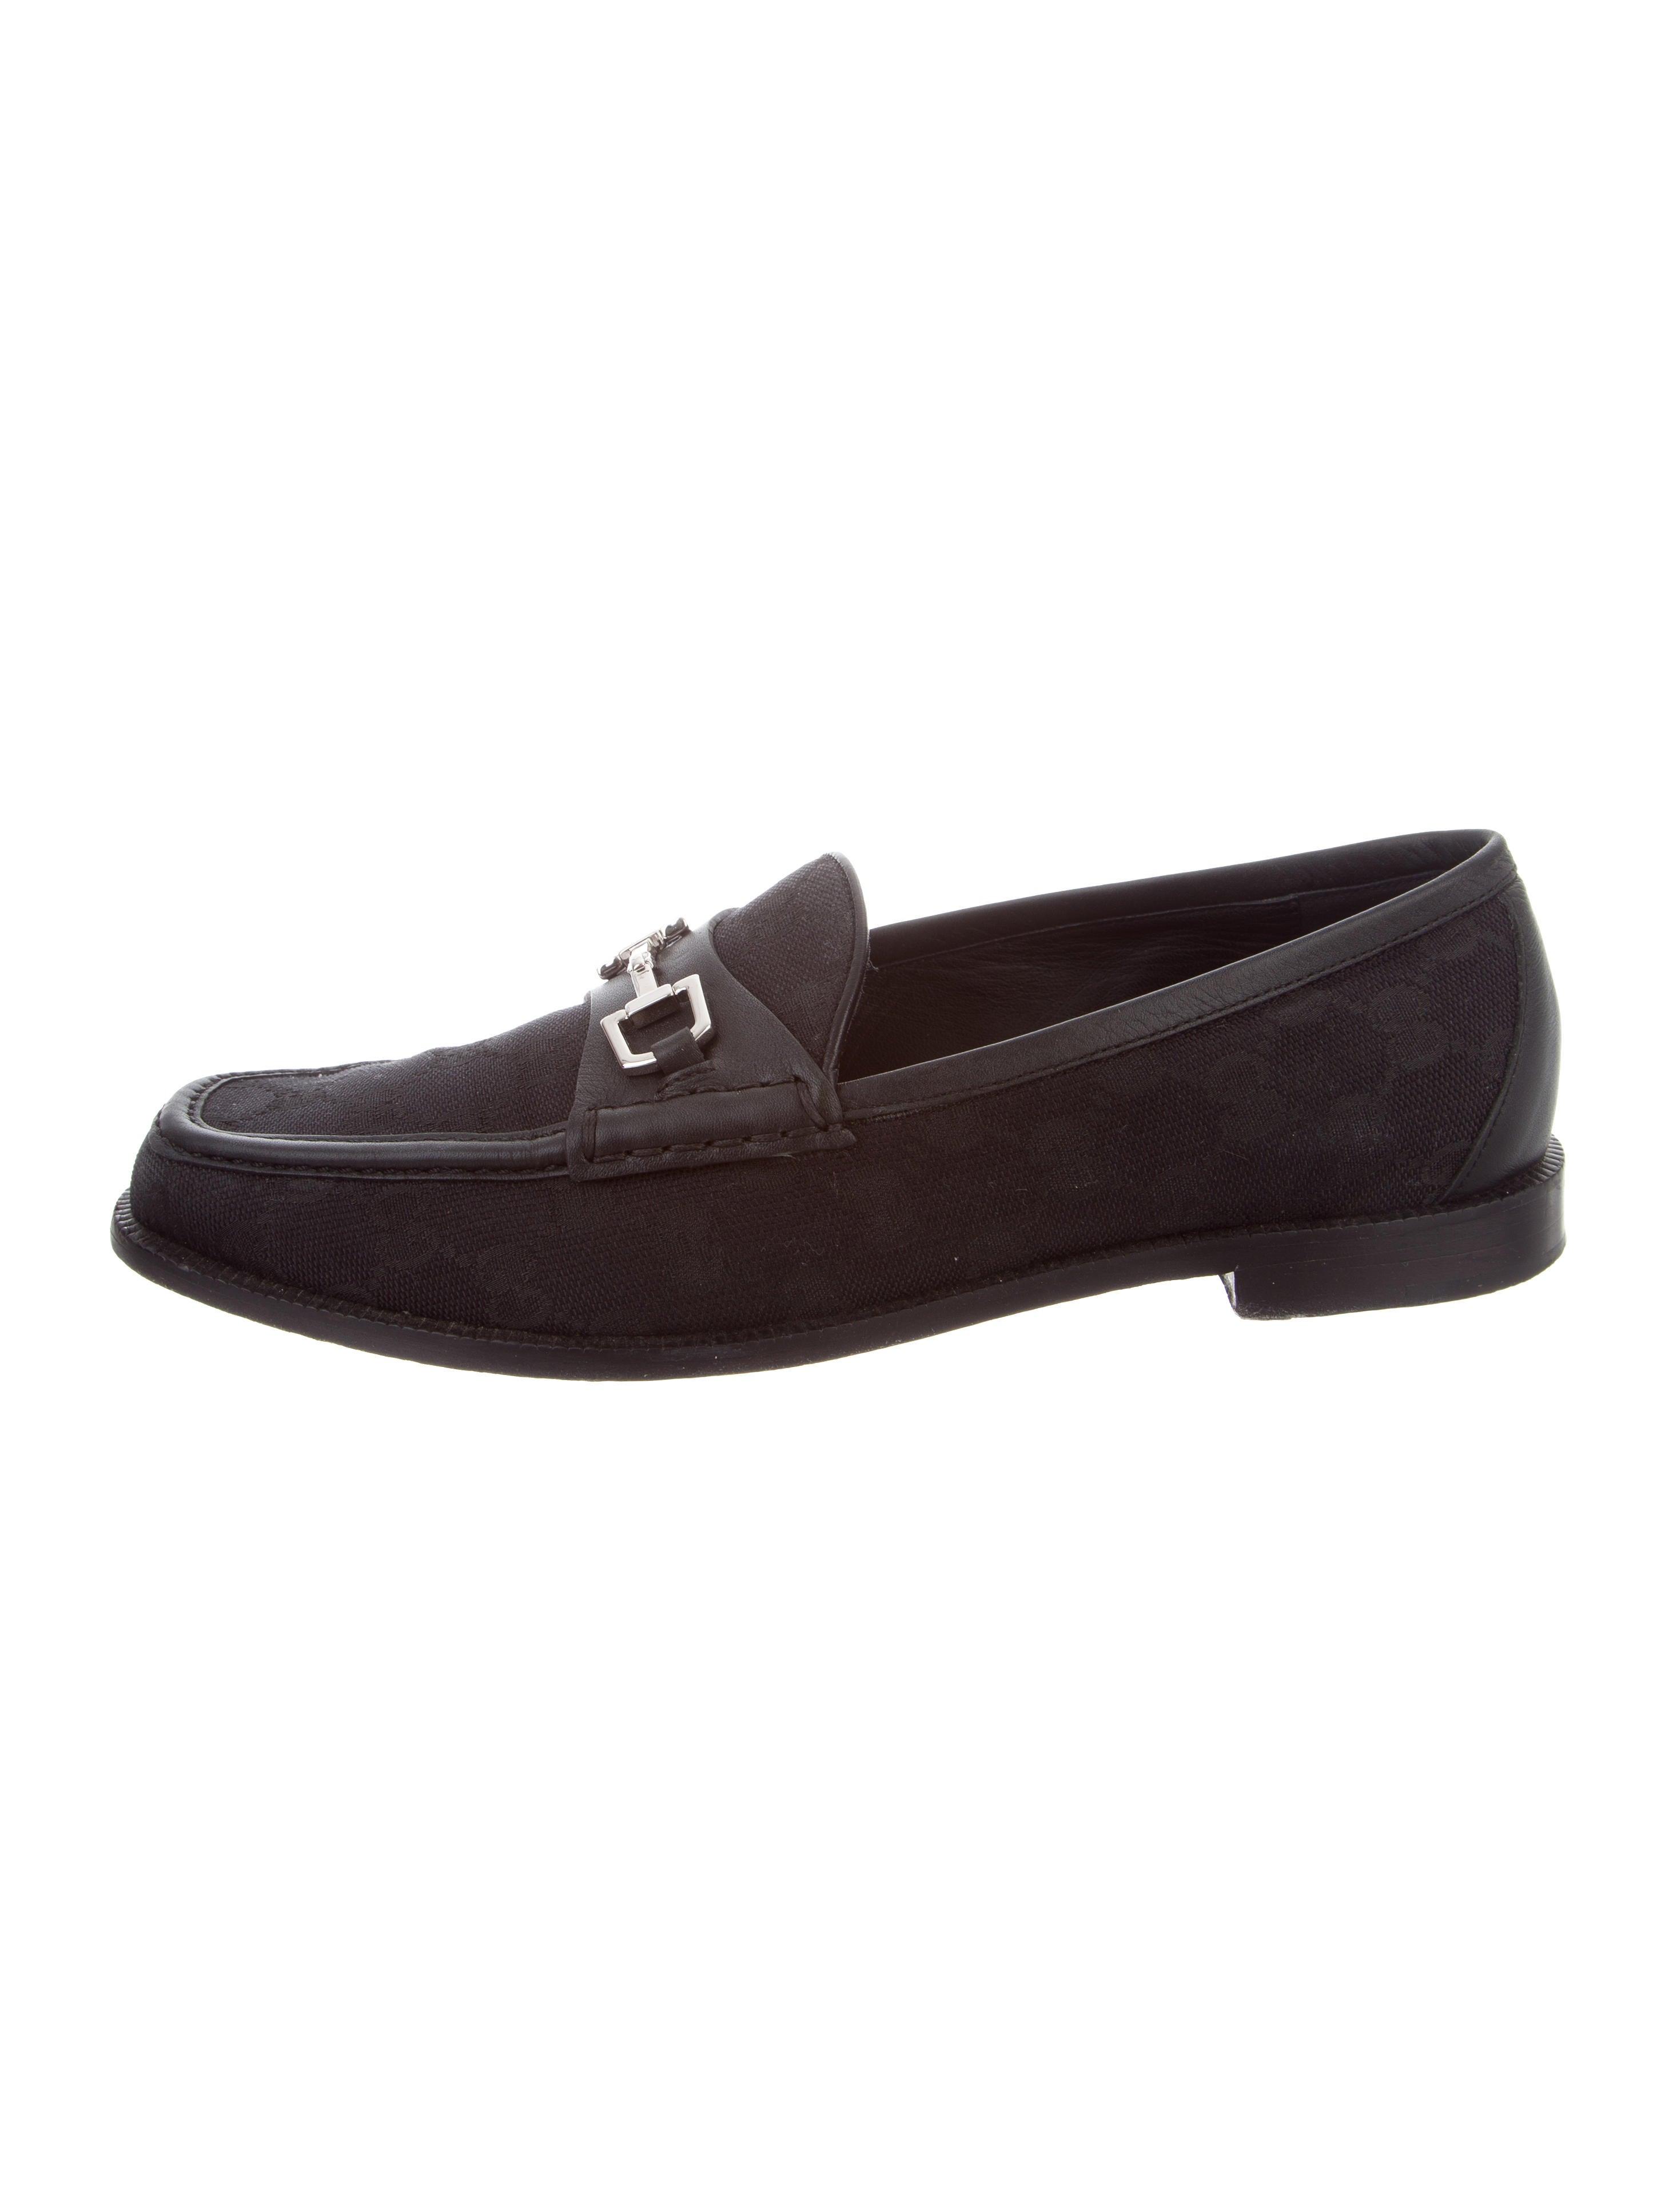 311090f20d6 Gucci GG Canvas Horsebit Loafers - Shoes - GUC184041